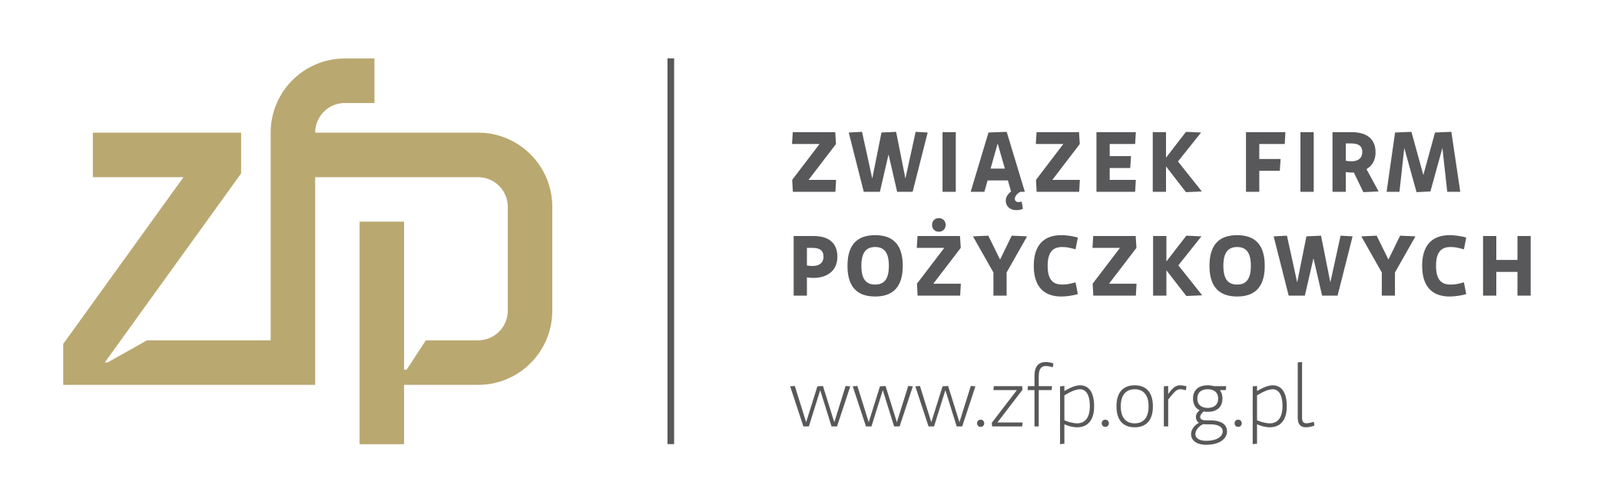 ZFP logo